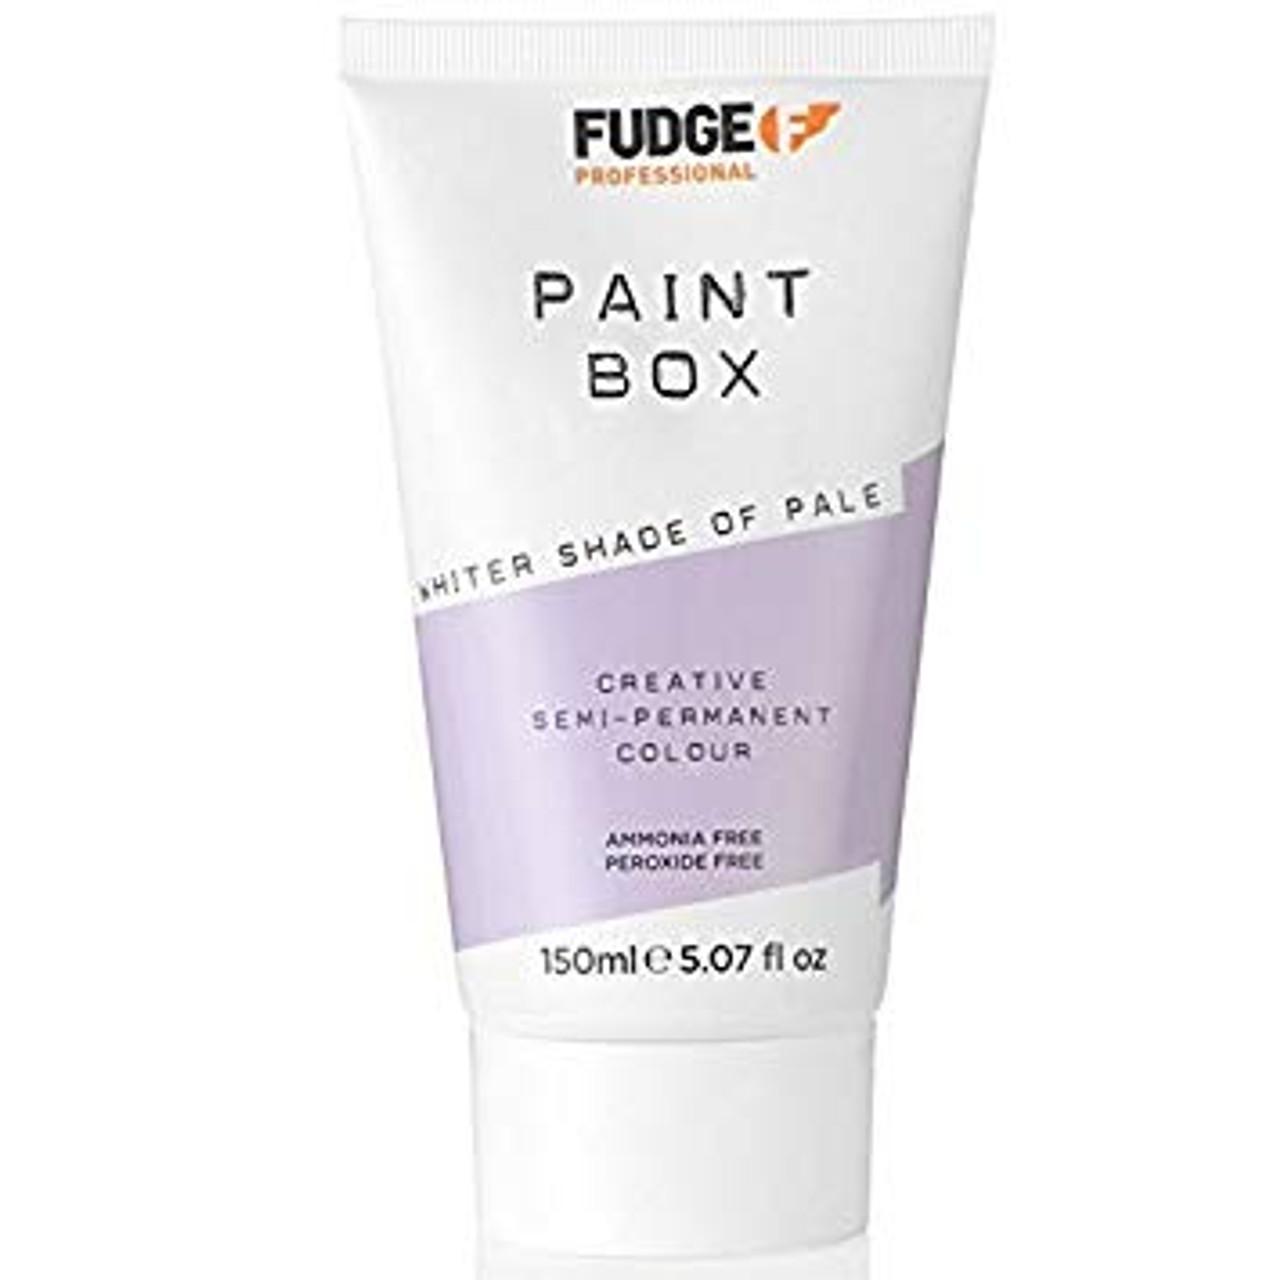 Fudge Whiter Shade of Pale 5 oz